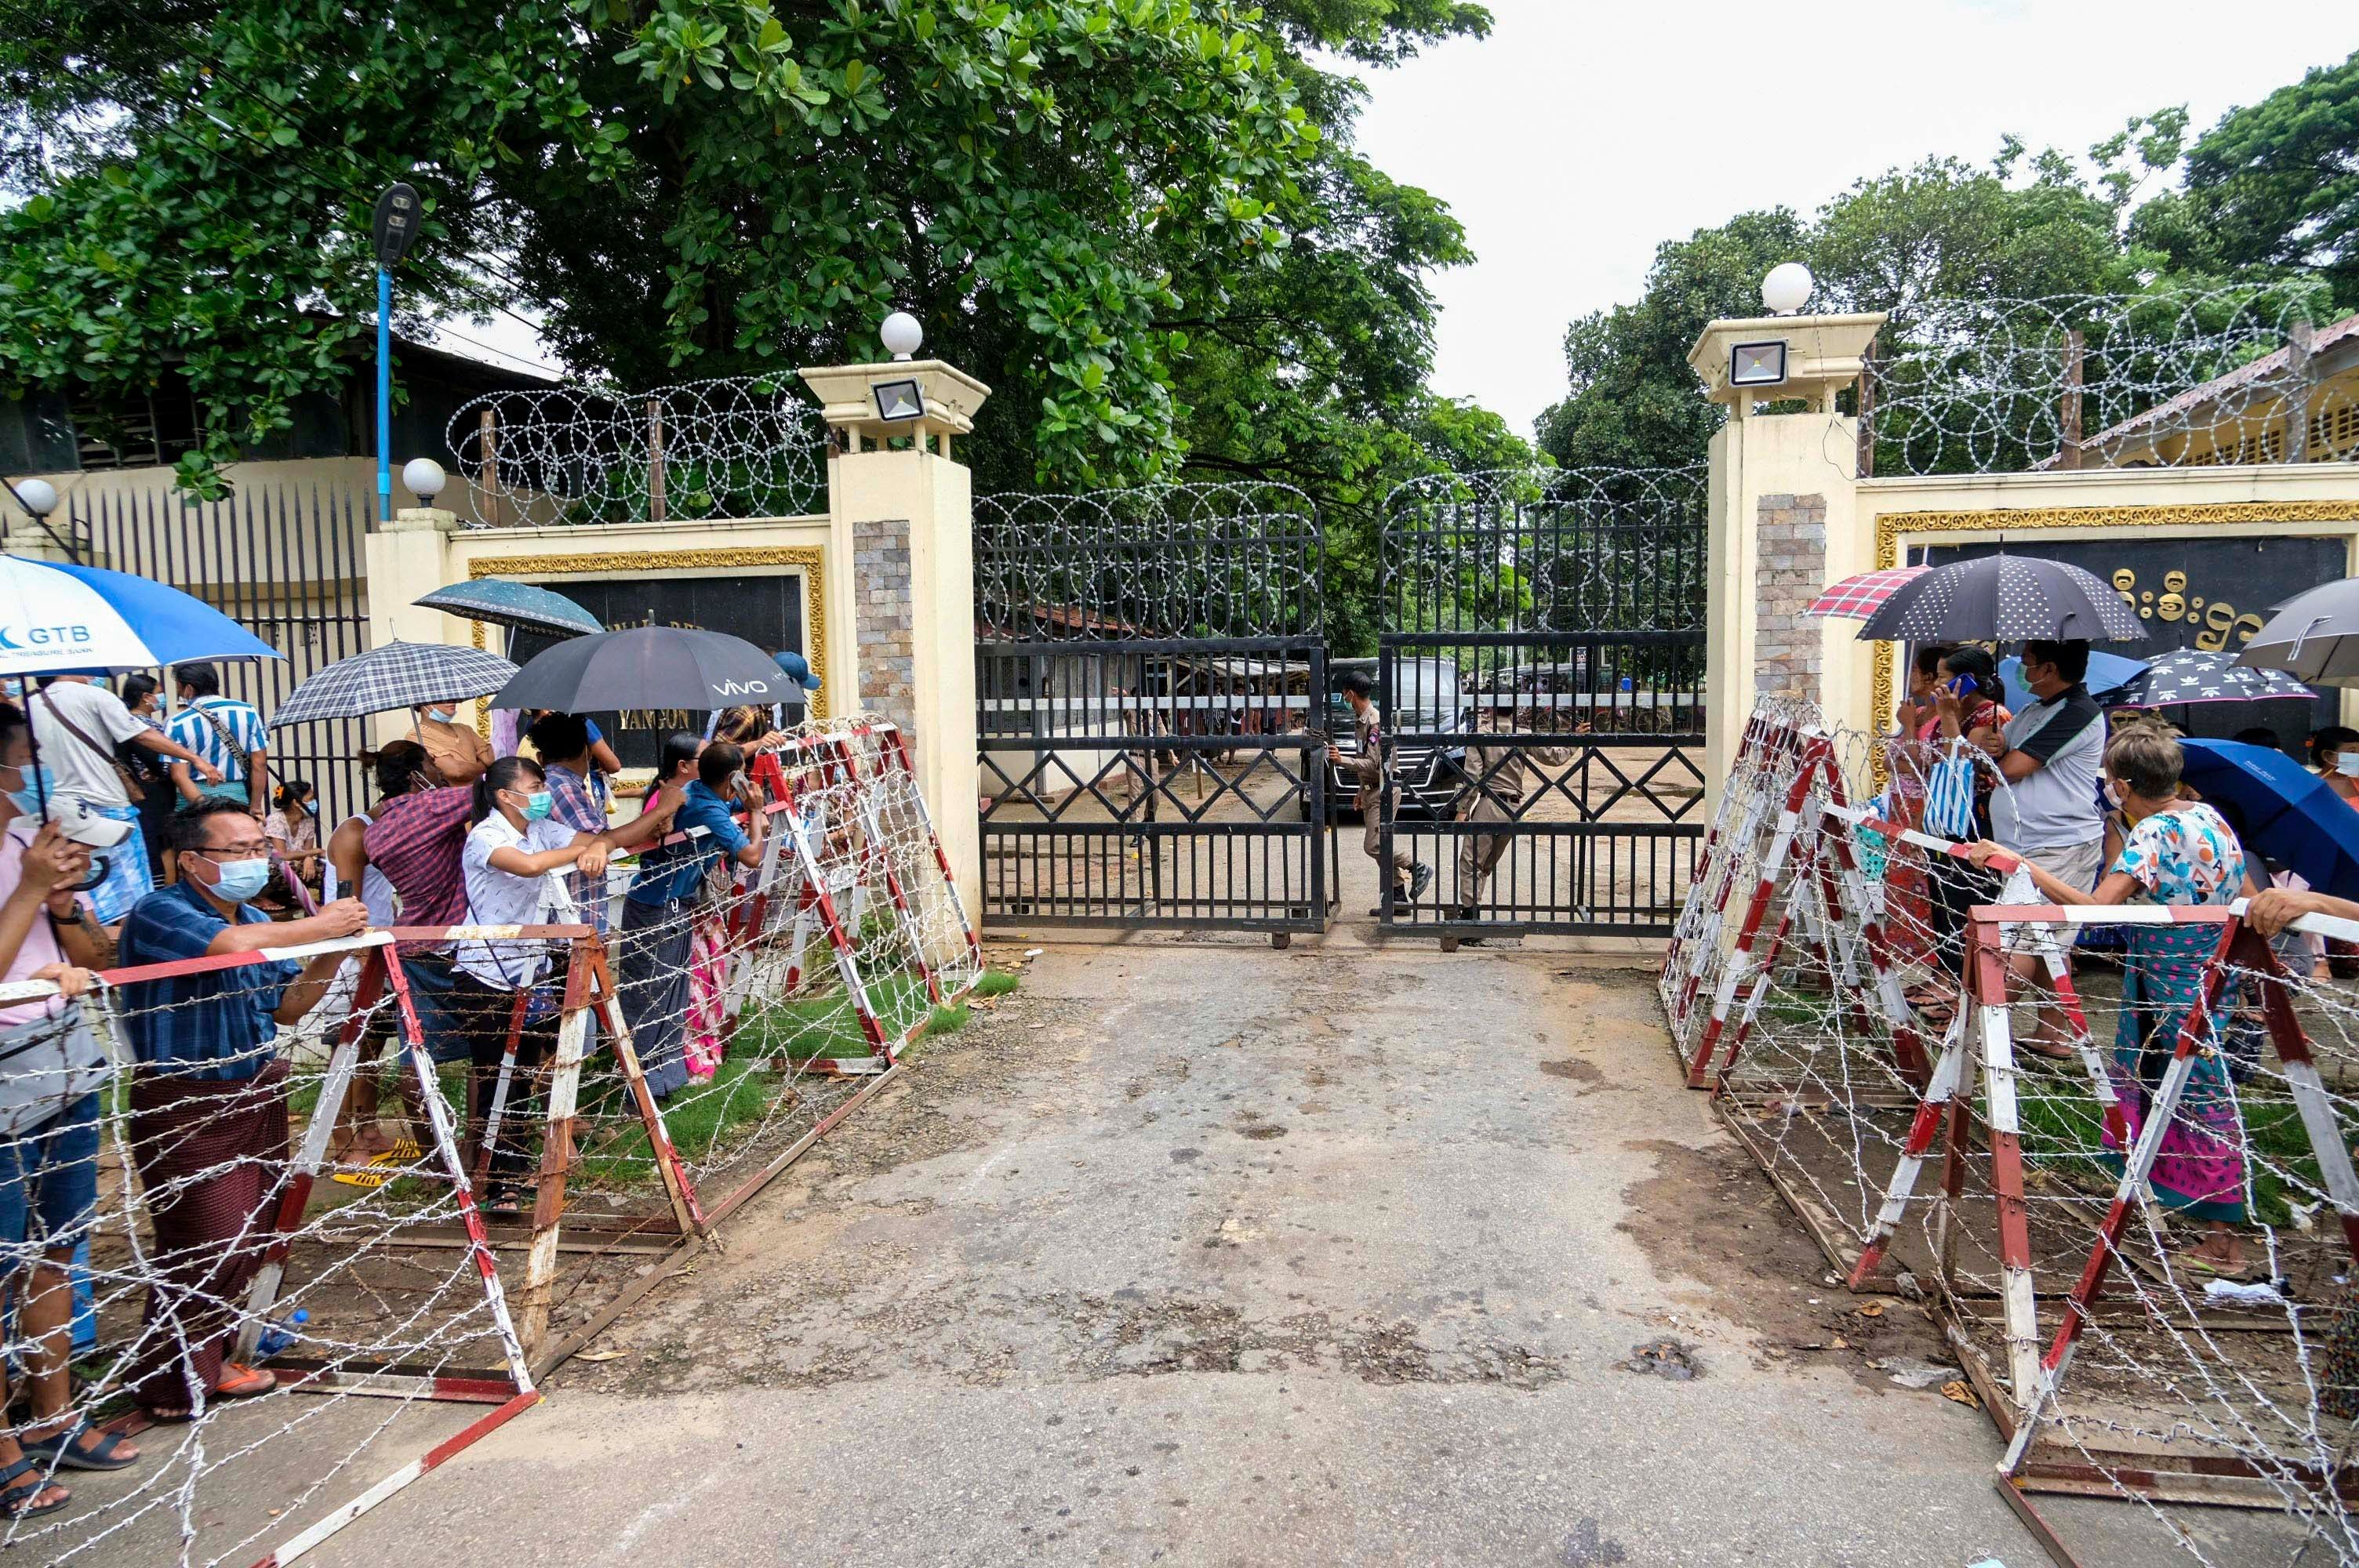 Covid-19 Surge in Myanmar's Prisons